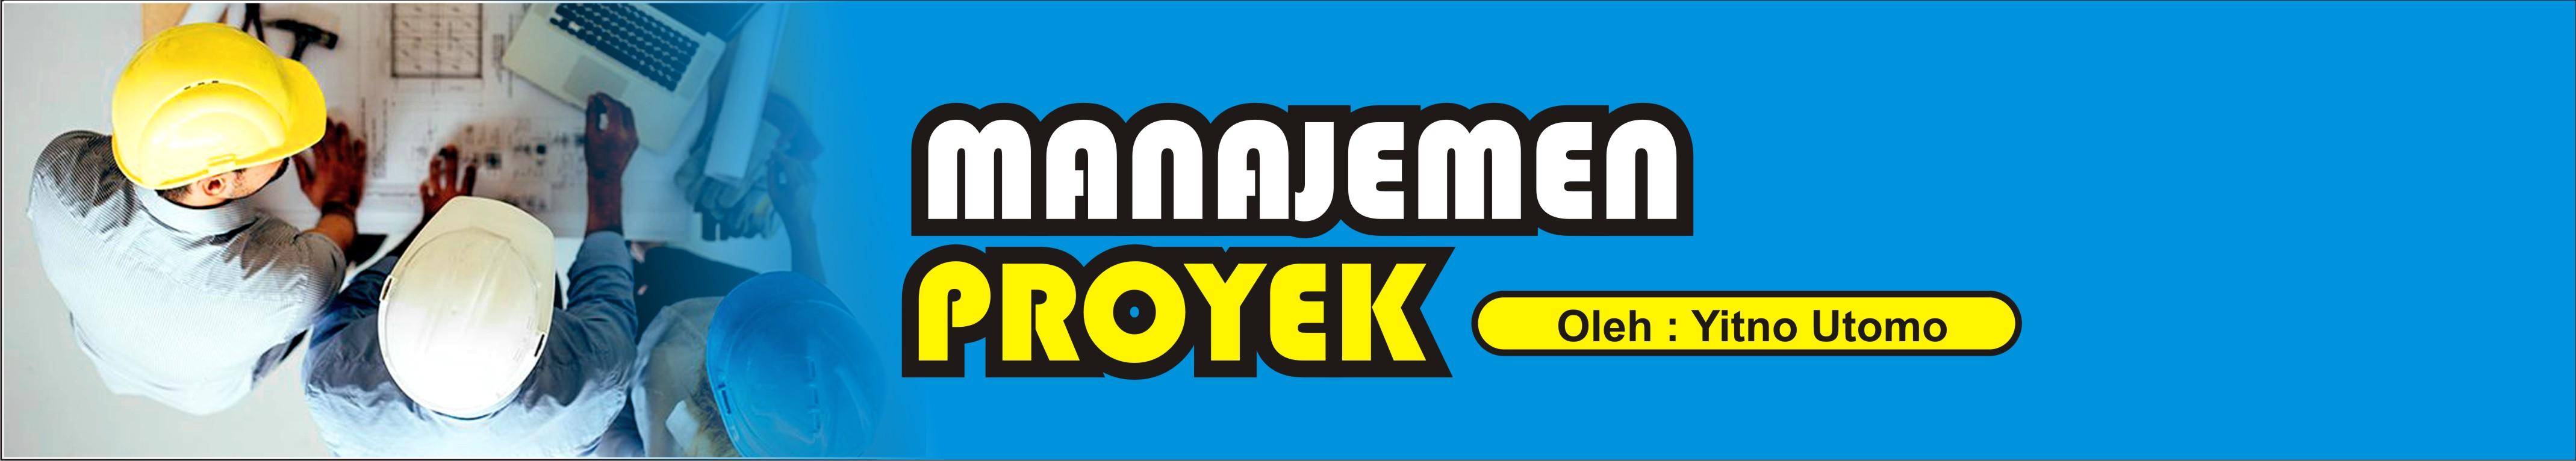 2019 - C - MANAJEMEN PROYEK